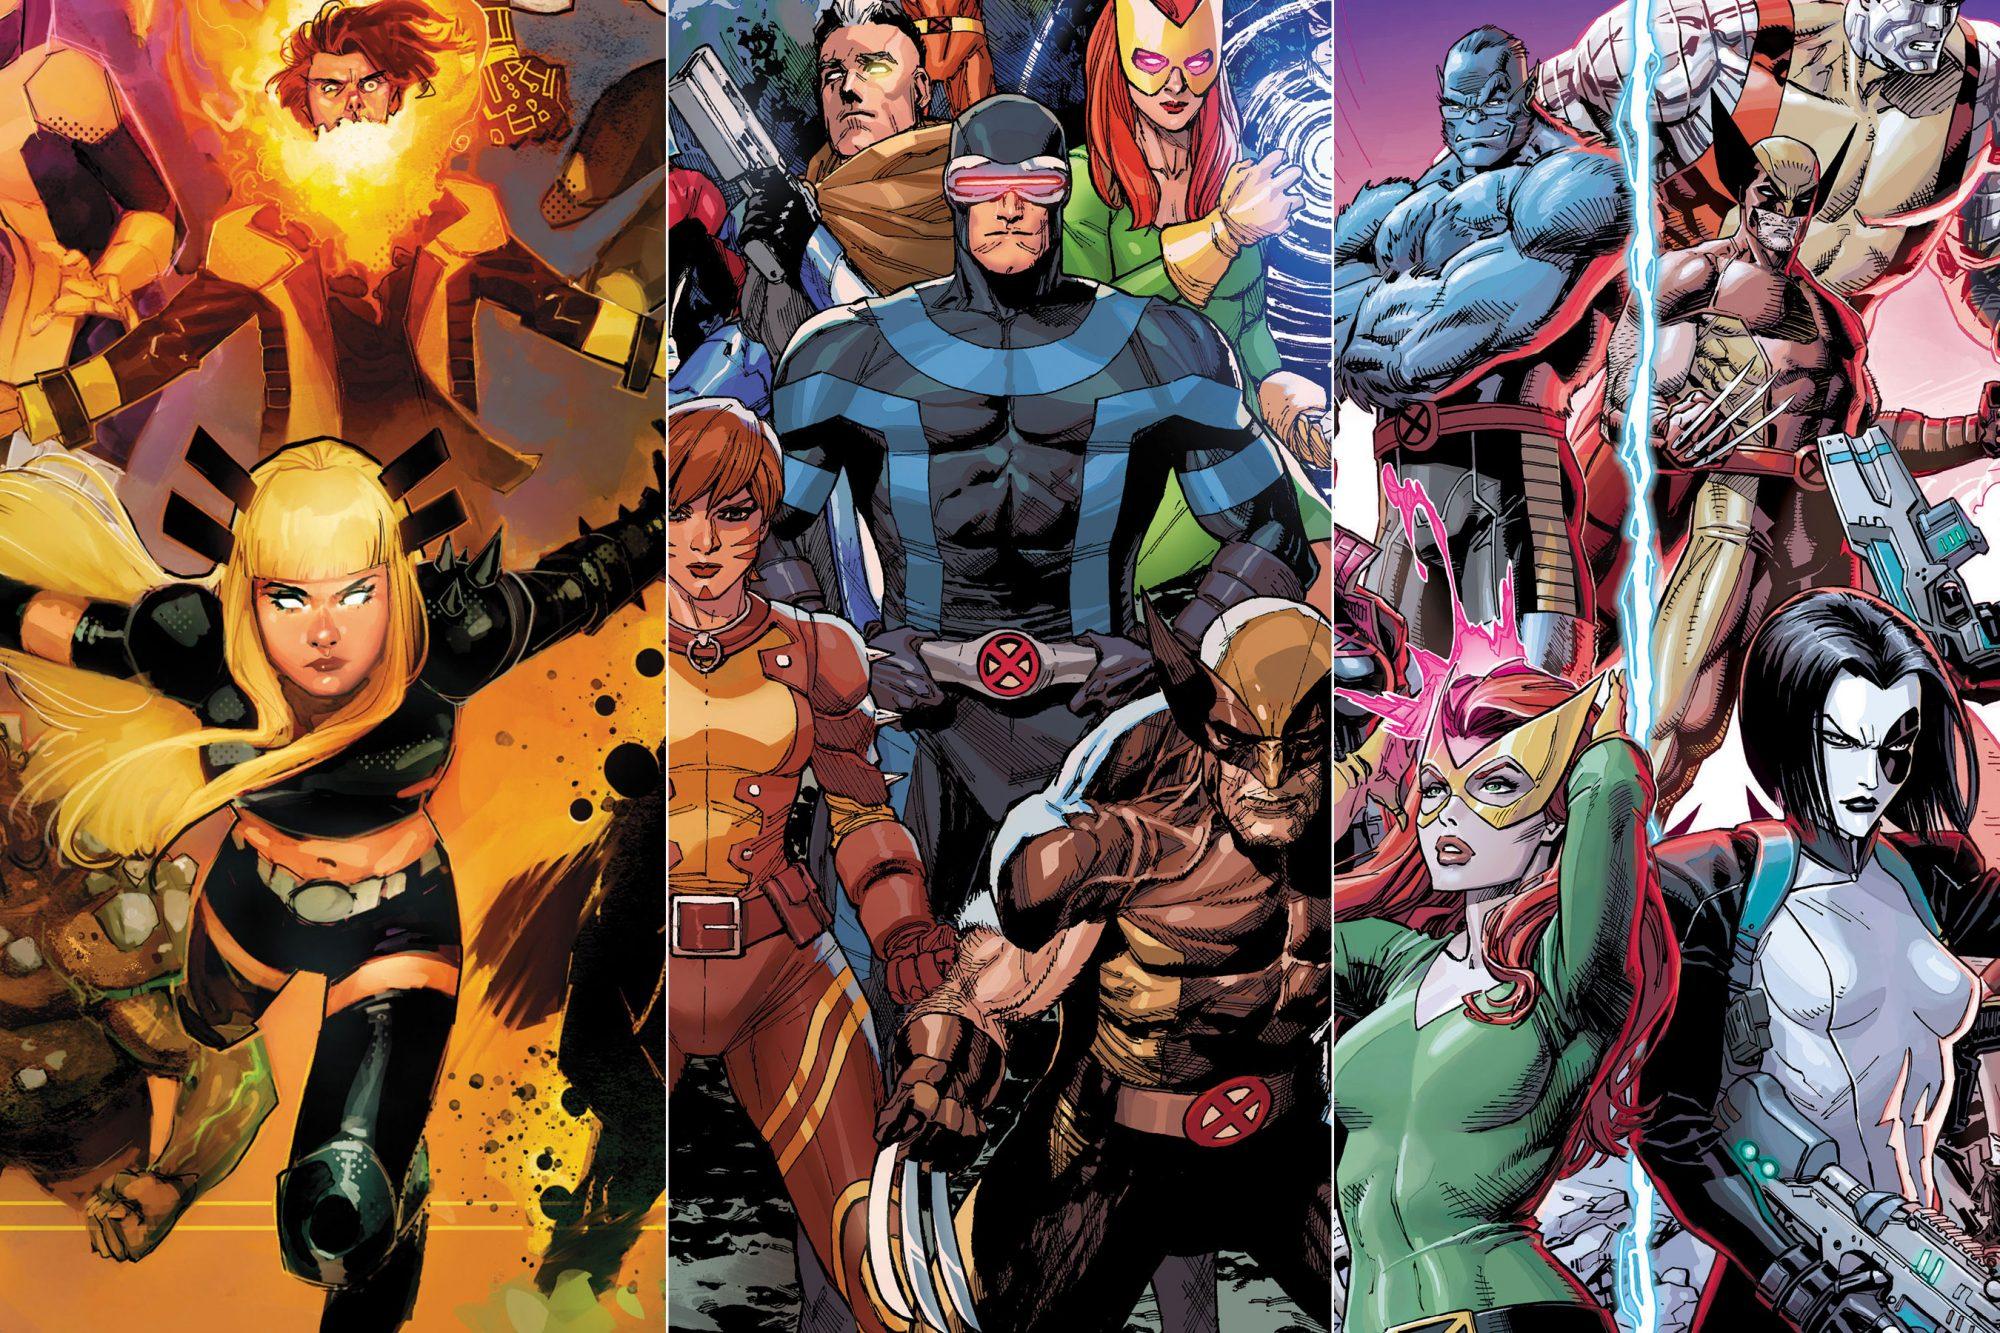 New Mutants, X Men, X Force